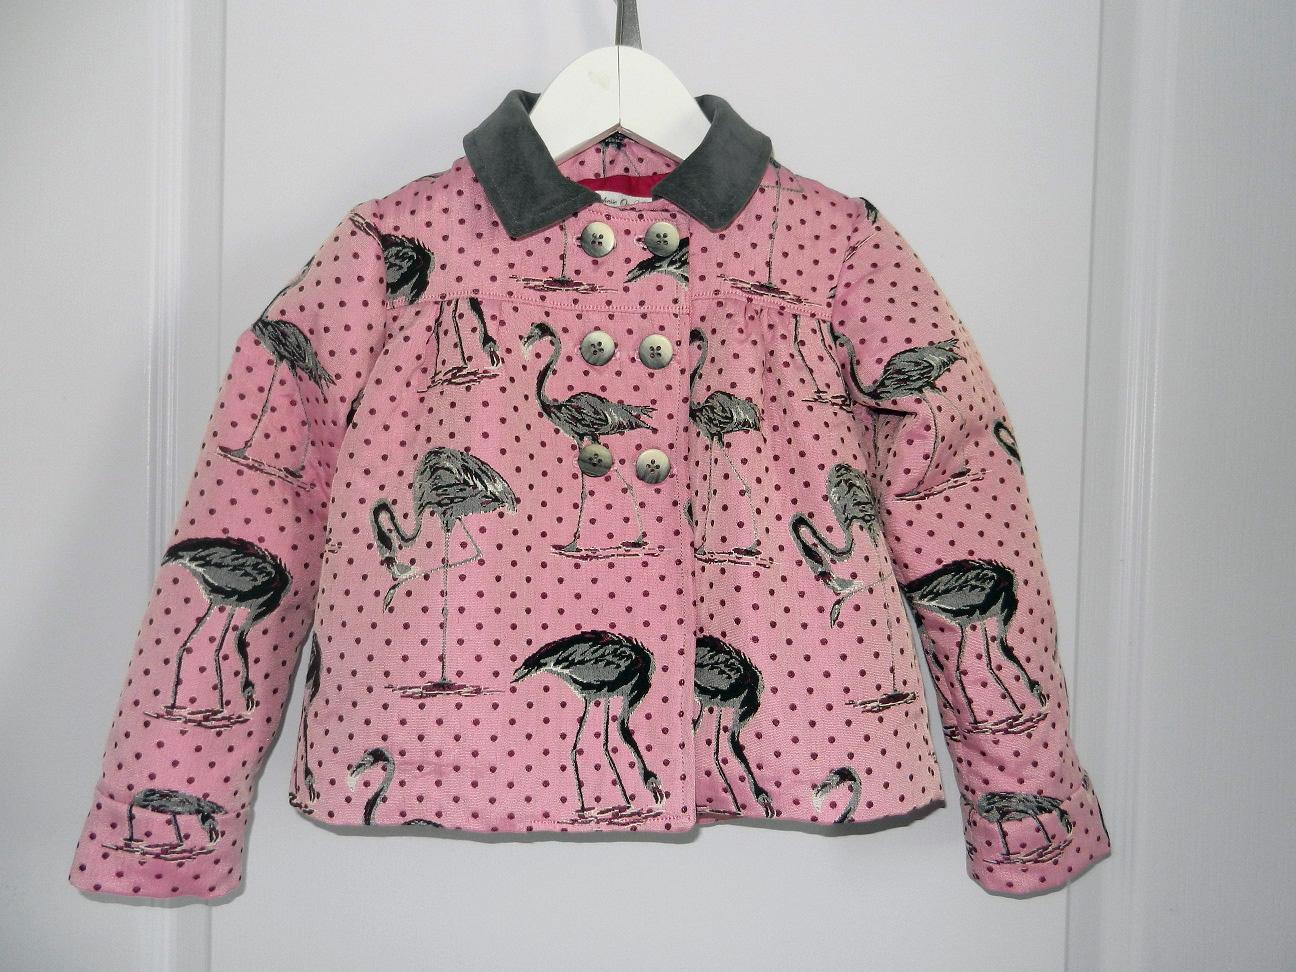 Duchesse or ange 263 veste flamands roses col velours gris pink flamingo jacket grey velvet collar a